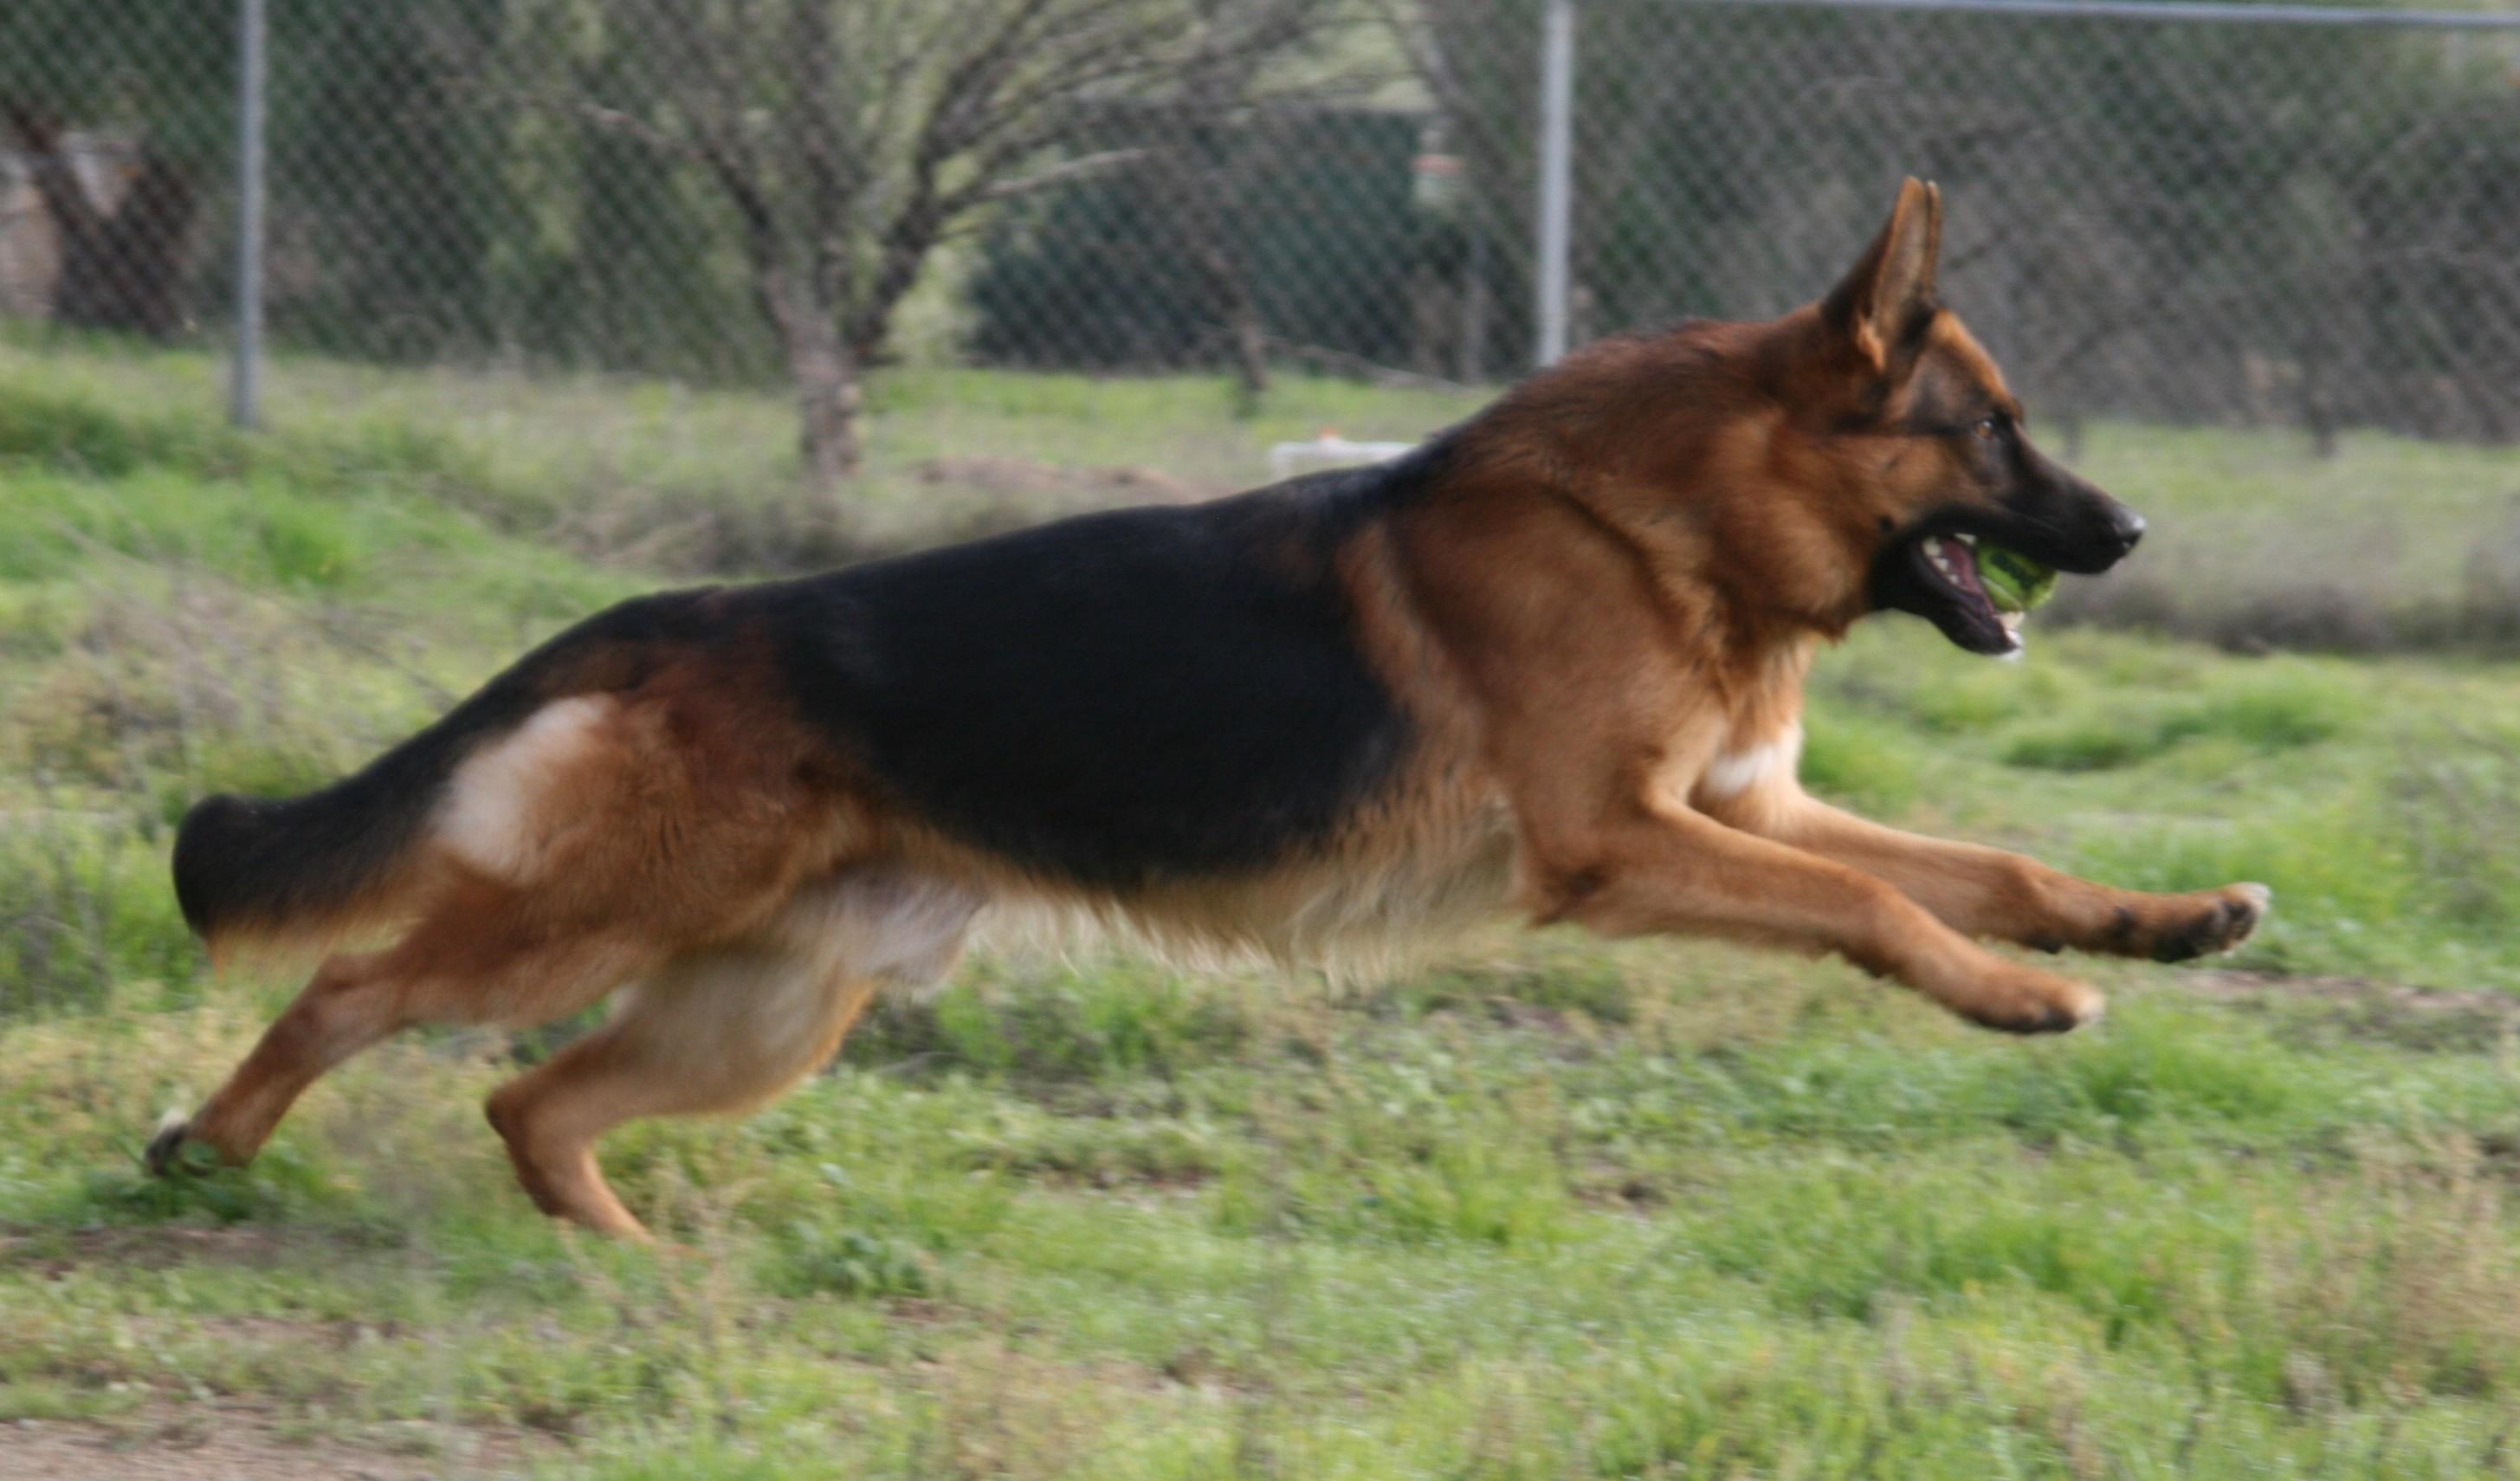 Home | West Coast German Shepherds | United States